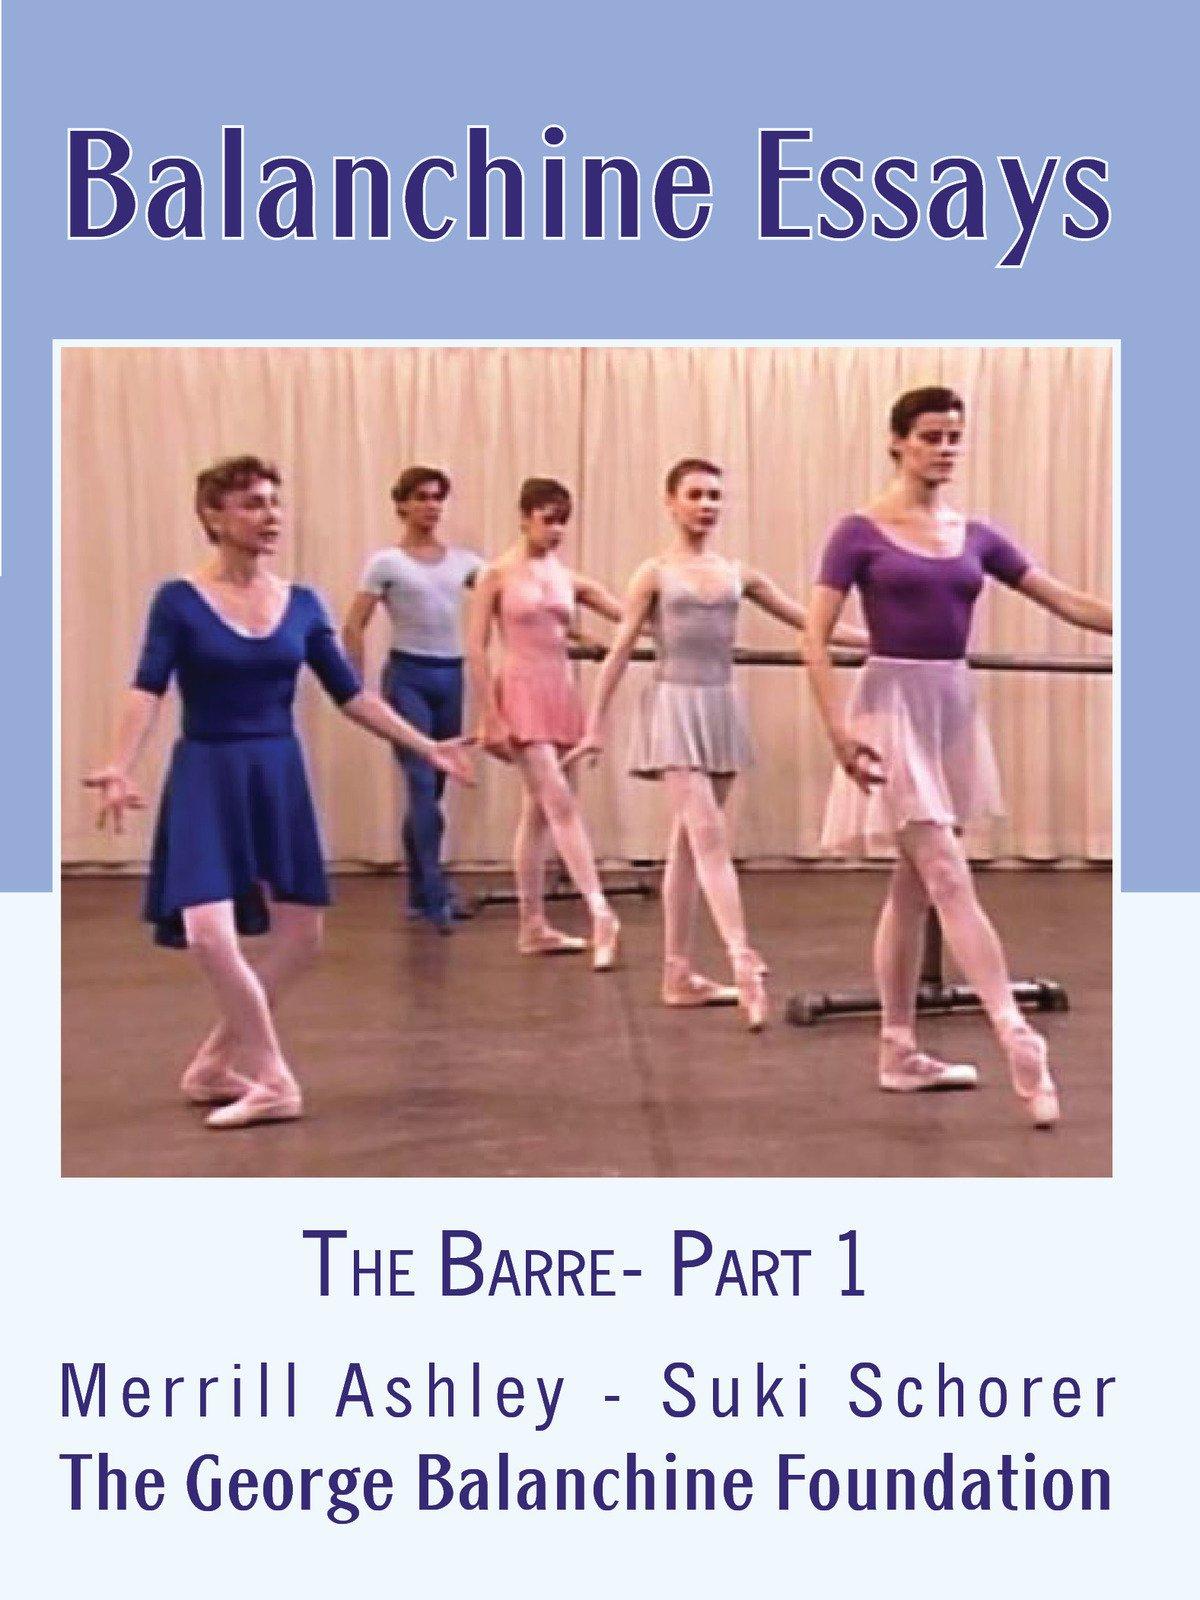 Balanchine Essays: The Barre - Part 1